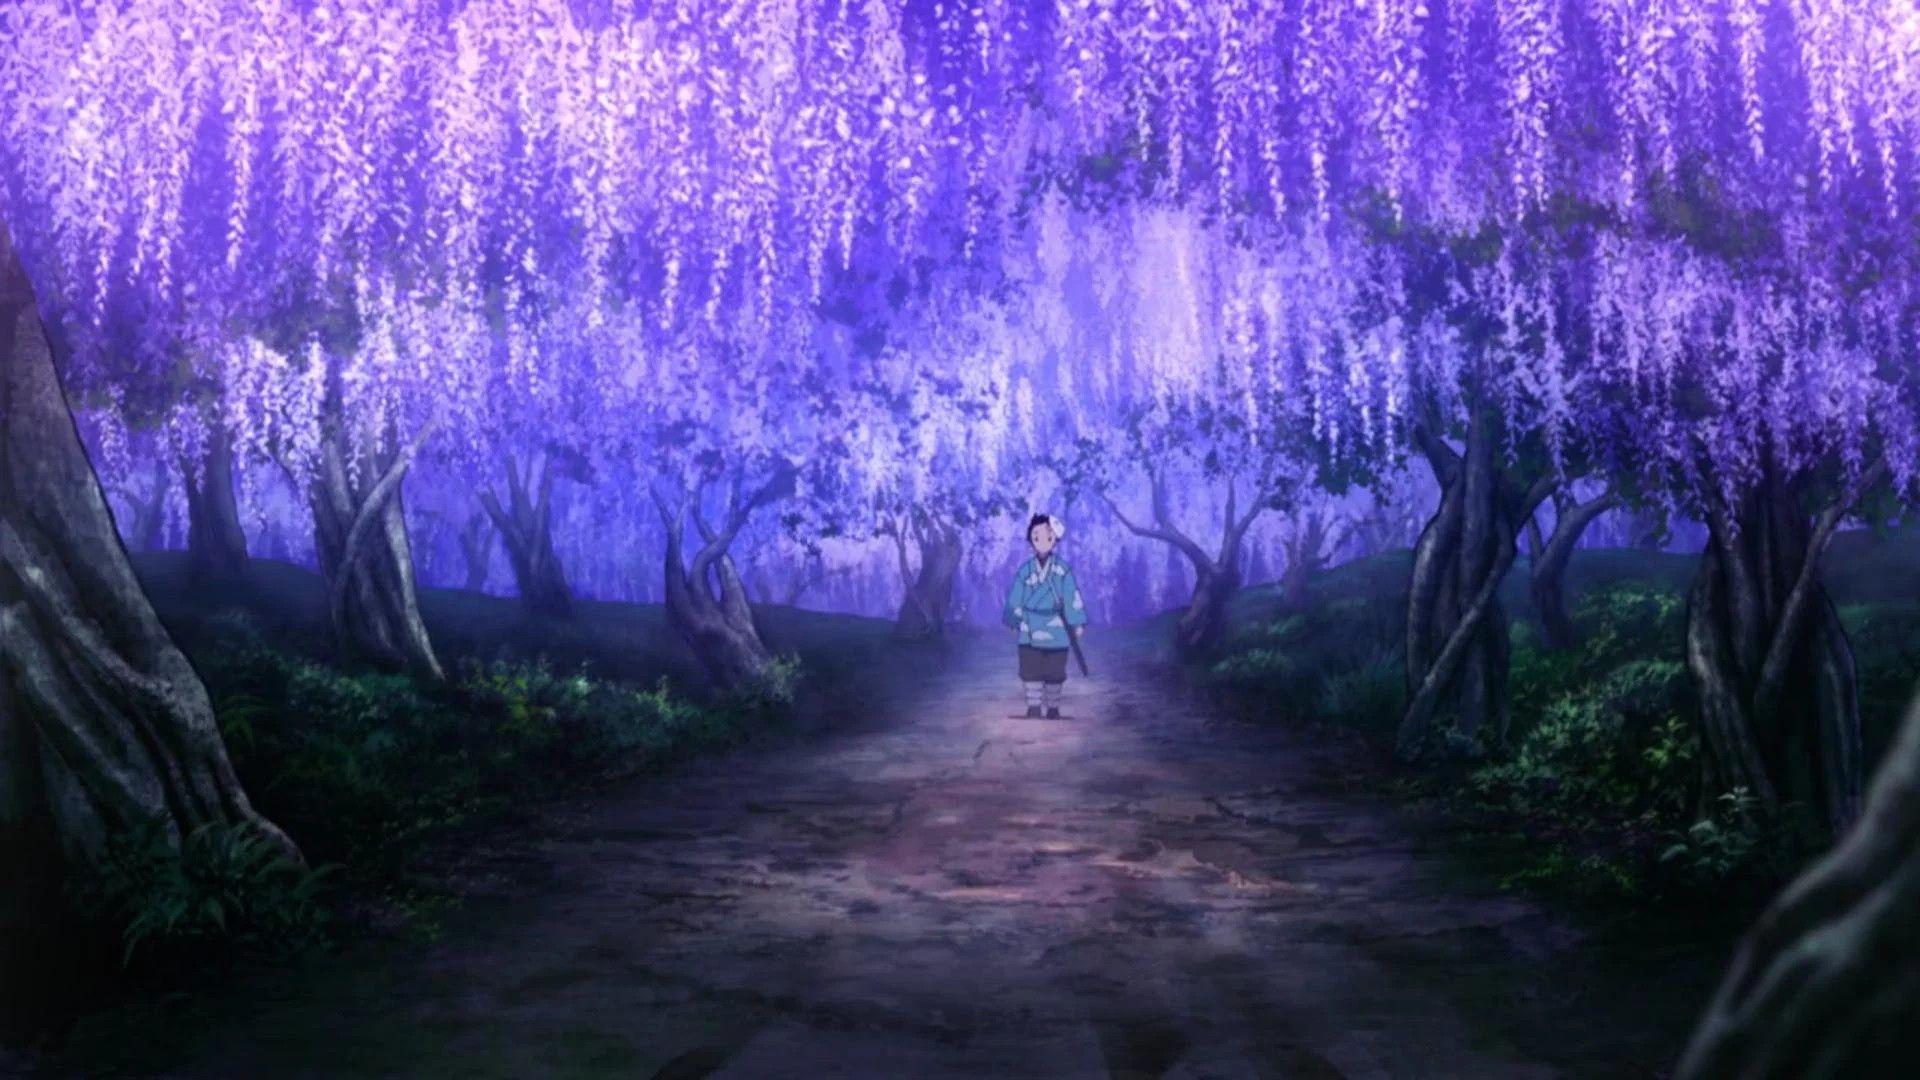 Pin by RIN刃 on 鬼滅の刃 Anime scenery, Anime places, Anime